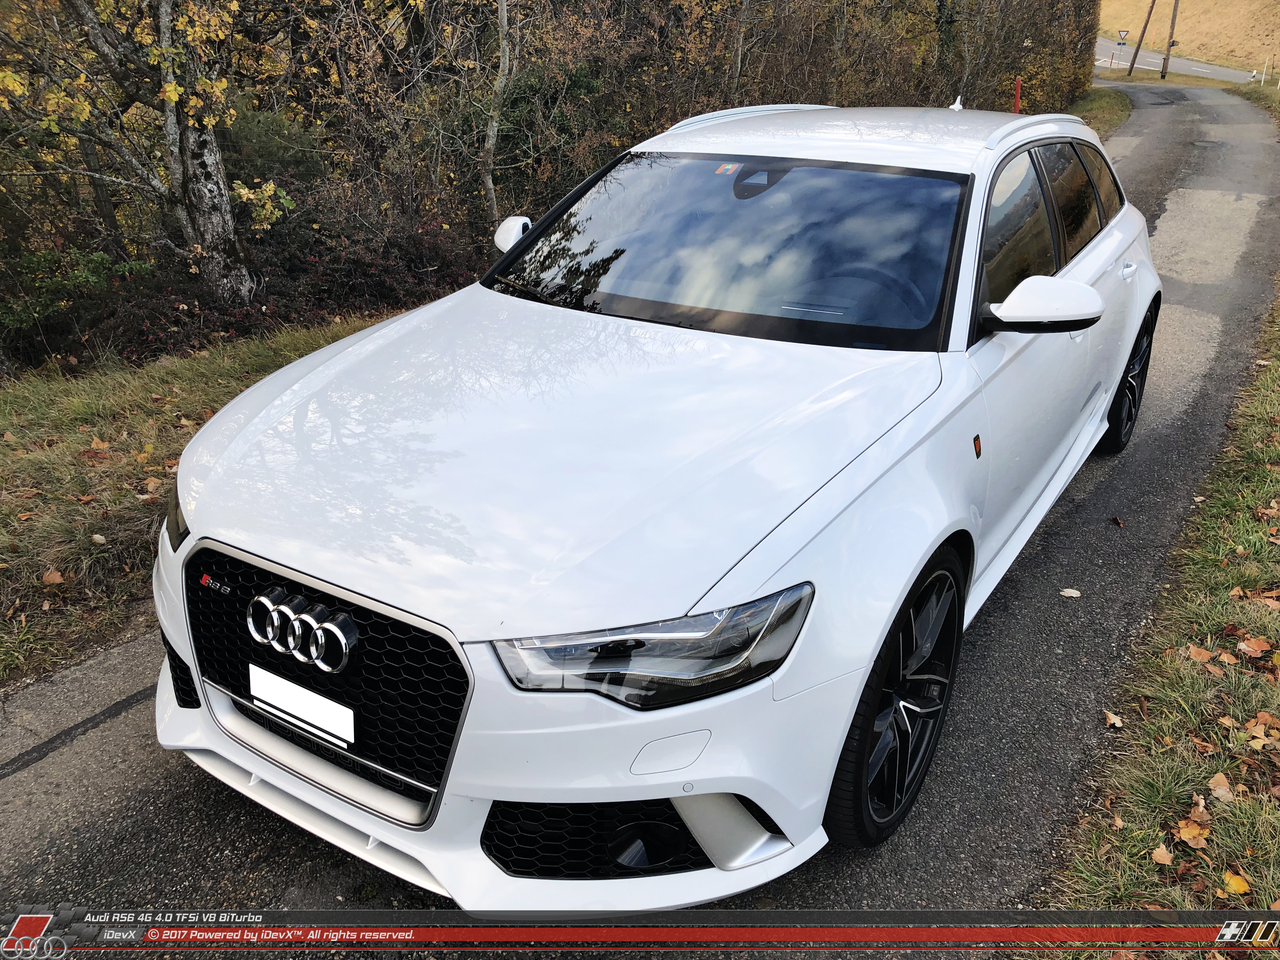 09_11.2018_Audi-RS6_iDevX_004.png